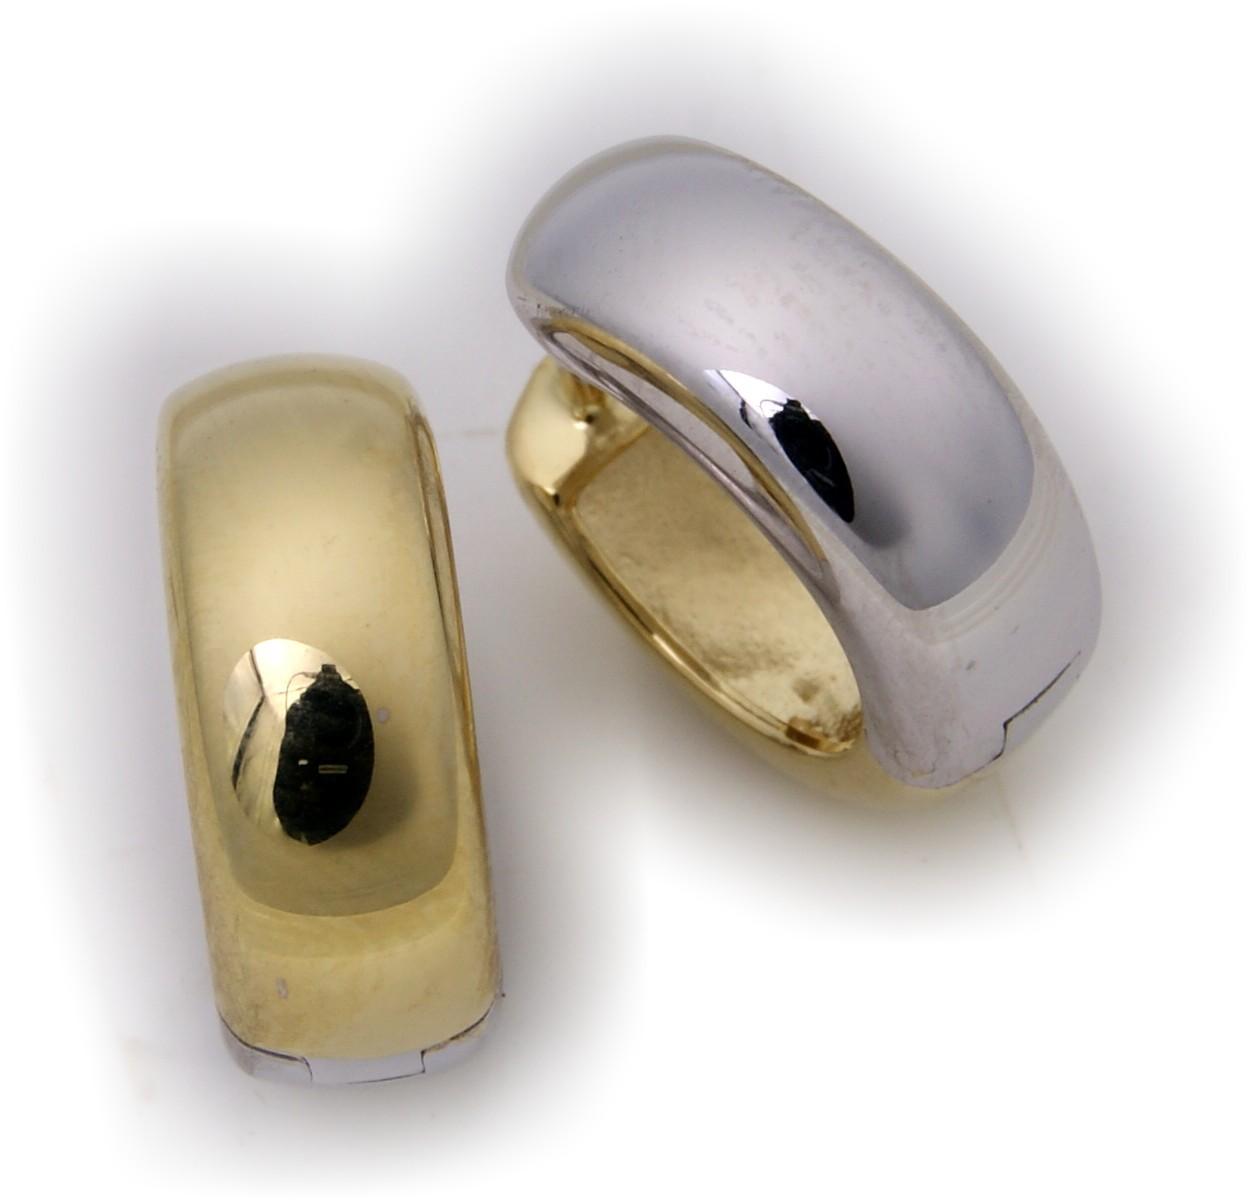 Ohrringe Klapp-Creolen halbrund echt Silber 925 Bicolor 16 mm Sterlingsilber gelb weiß